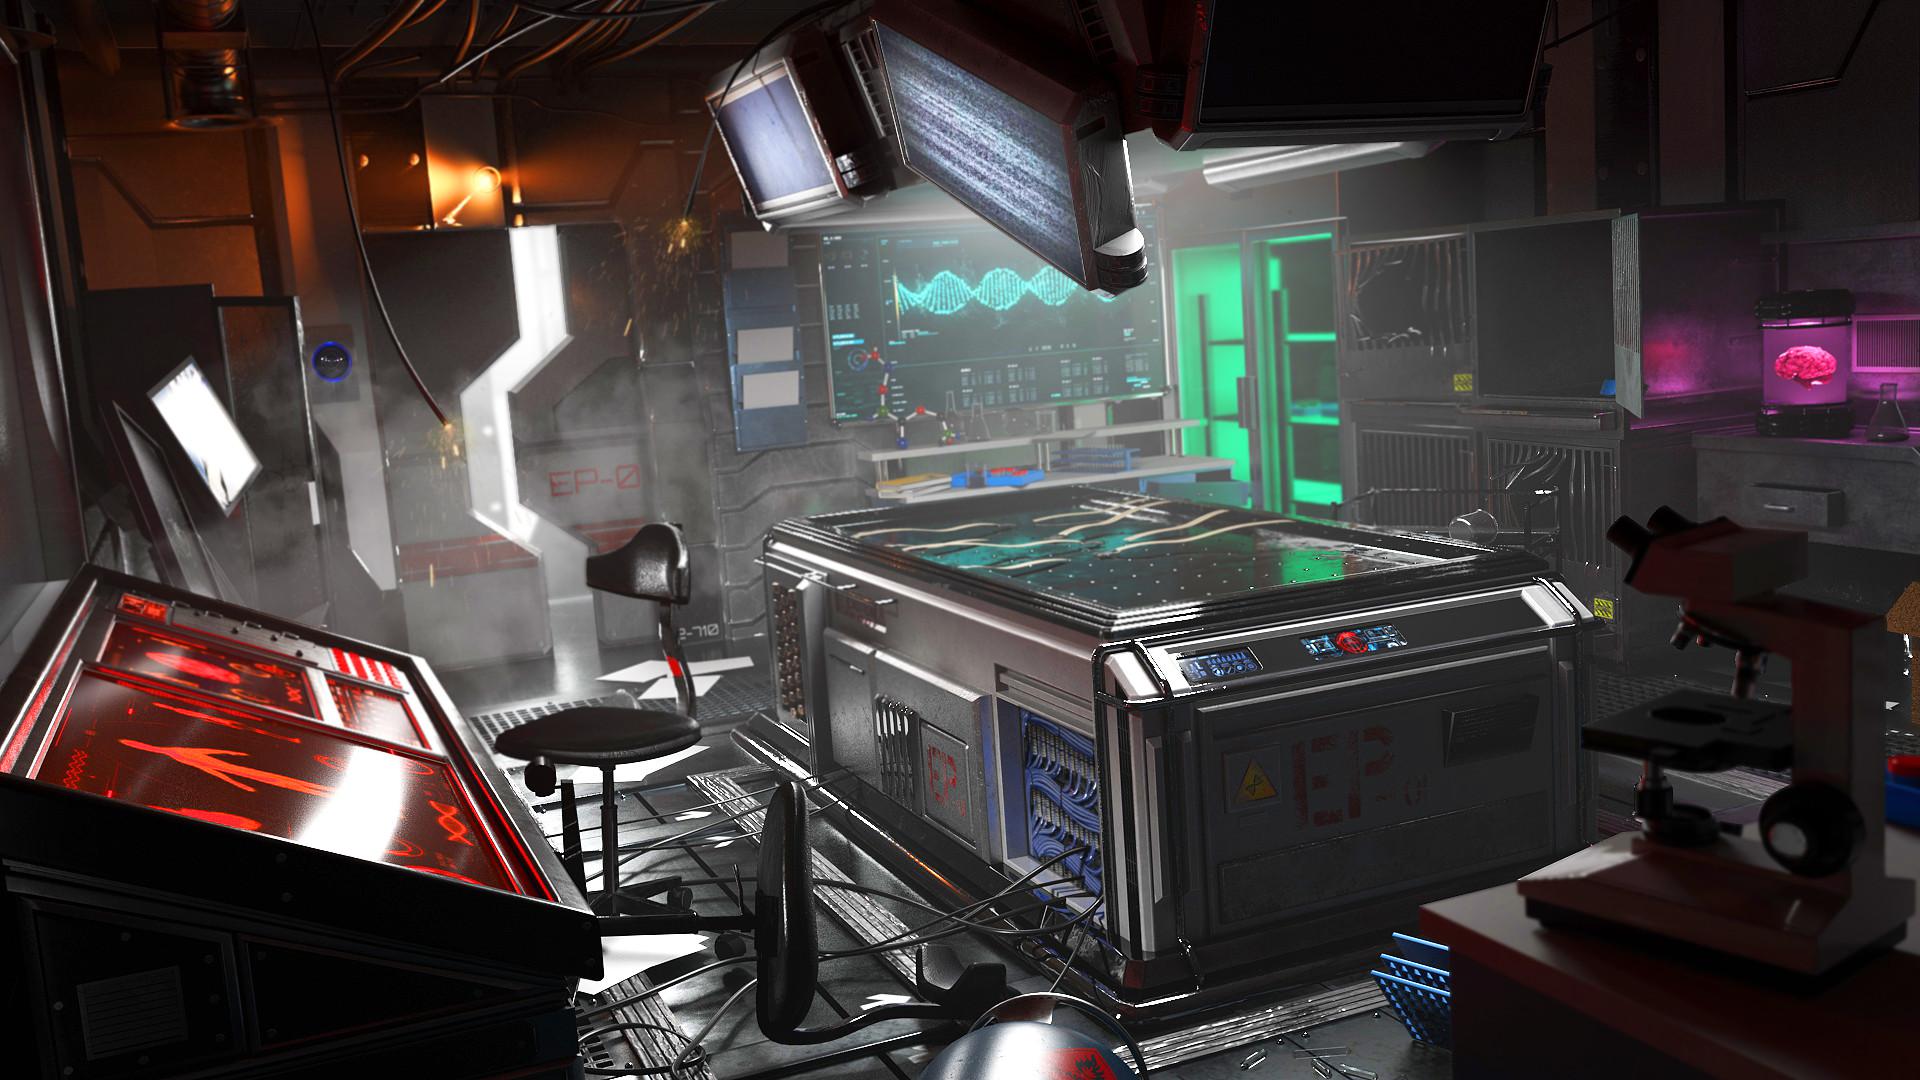 ArtStation - Futuristic Laboratory, Victor Ochoa Diz